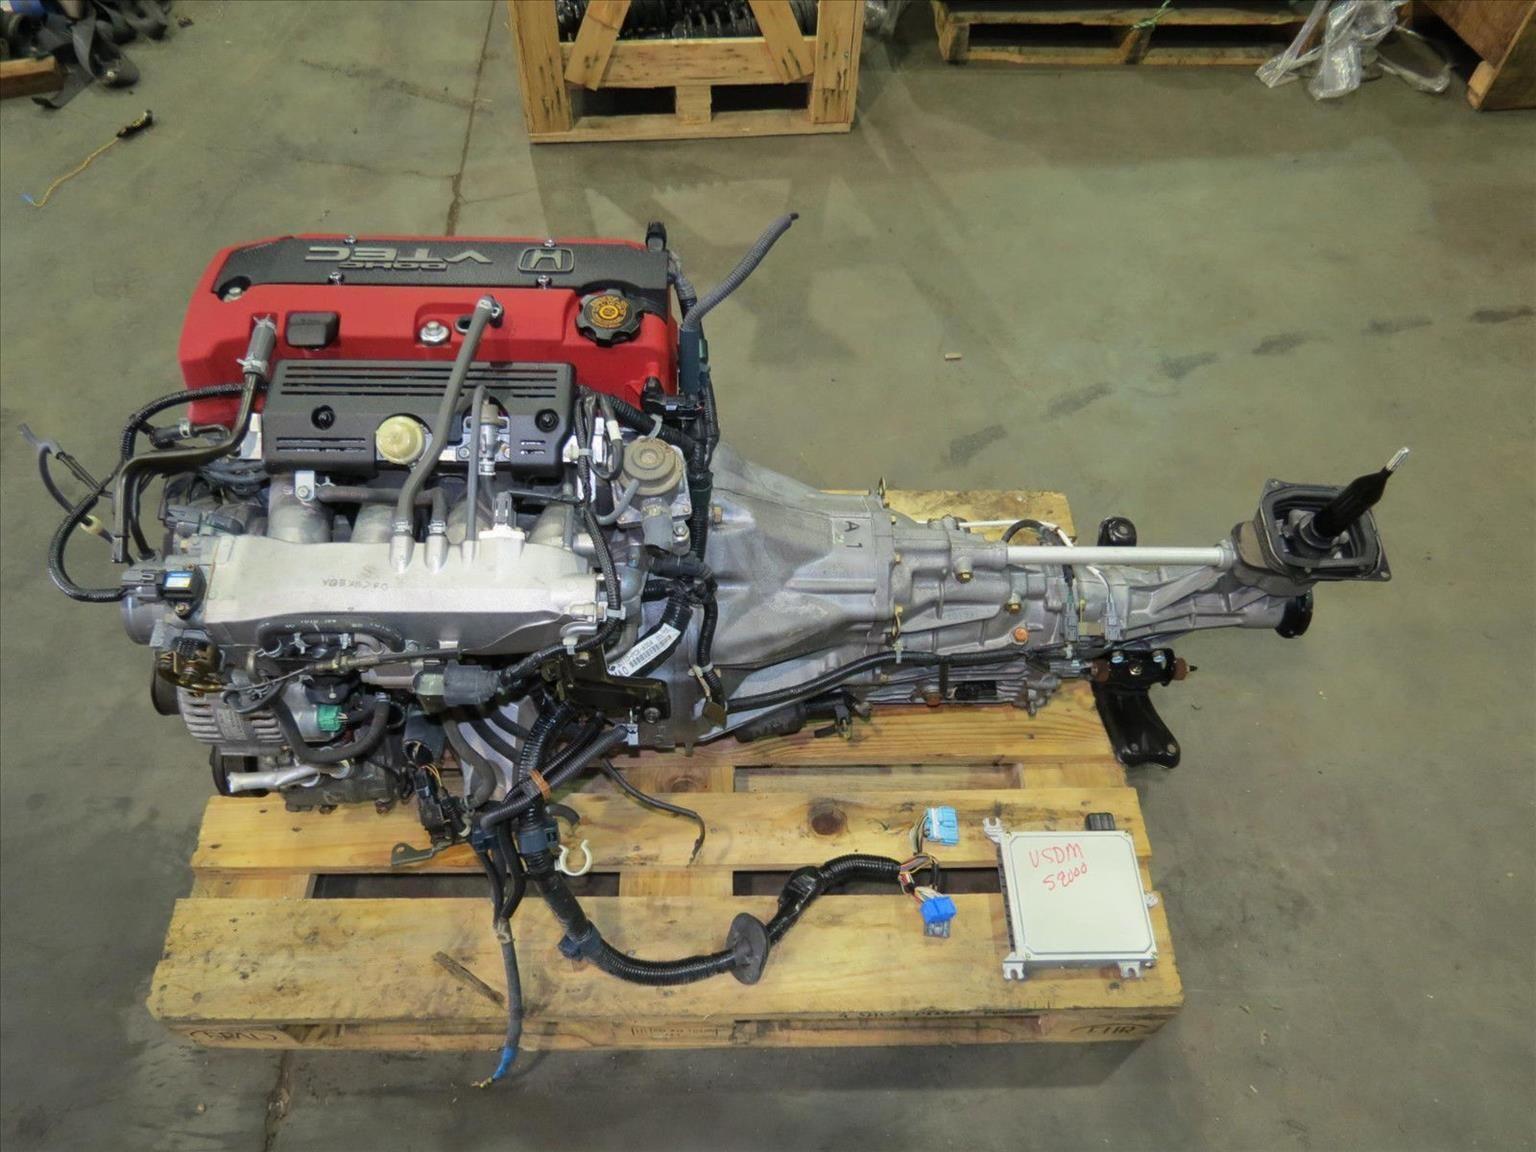 Jdm Honda S2000 Ap1 F20c Engine 2 0l Dohc Vtec Motor 6 Speed With Diff Axles Jdm Honda Honda S2000 Vtec